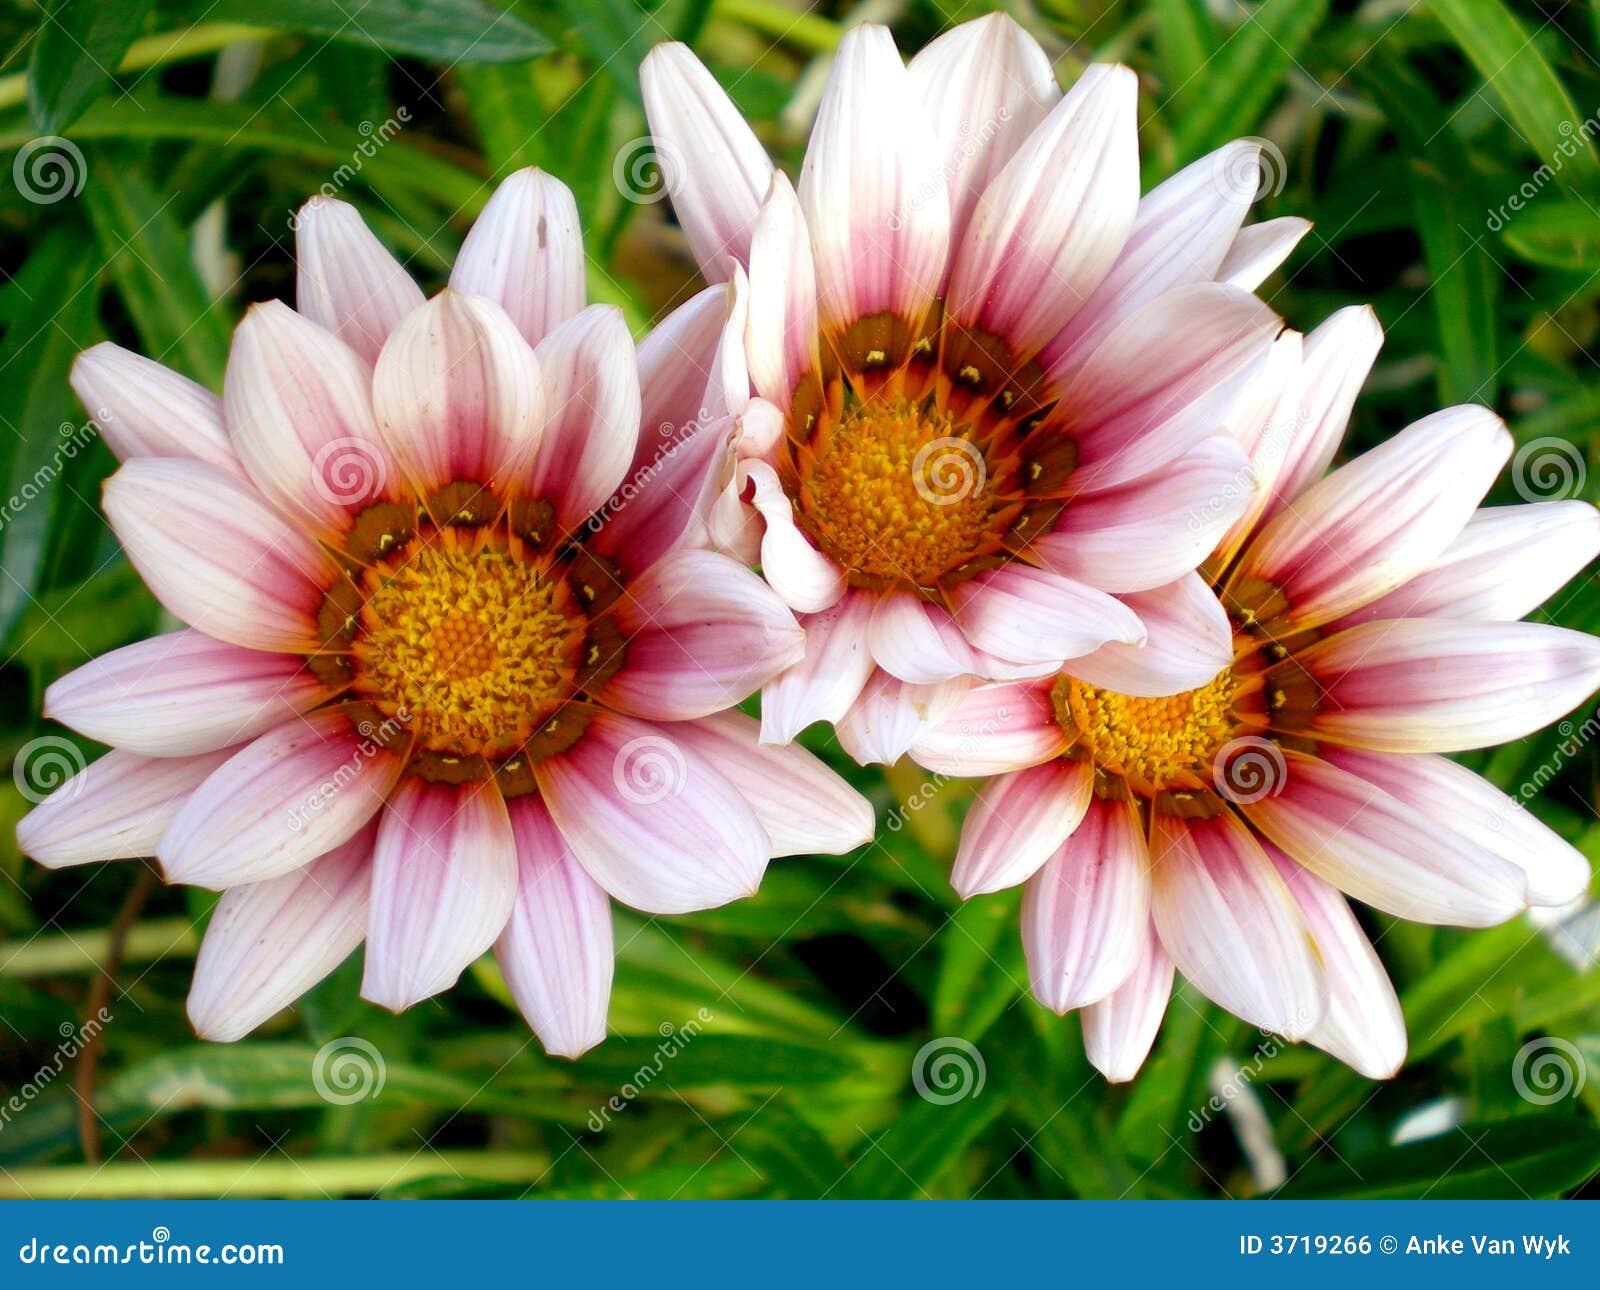 African Gazania flowers